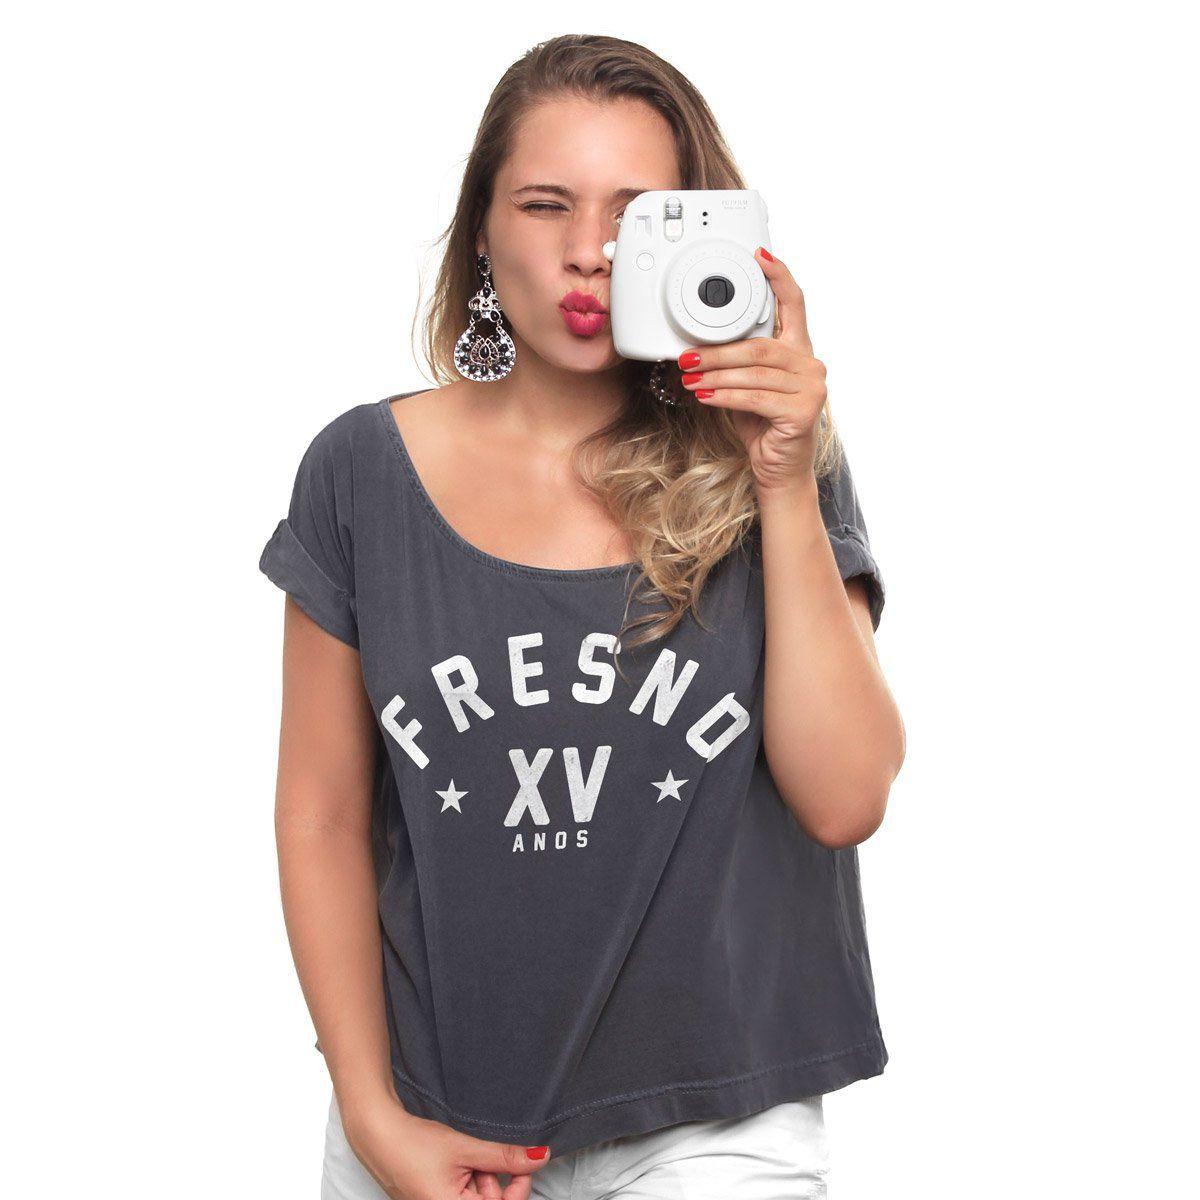 T-shirt Premium Feminina Fresno XV Anos Star